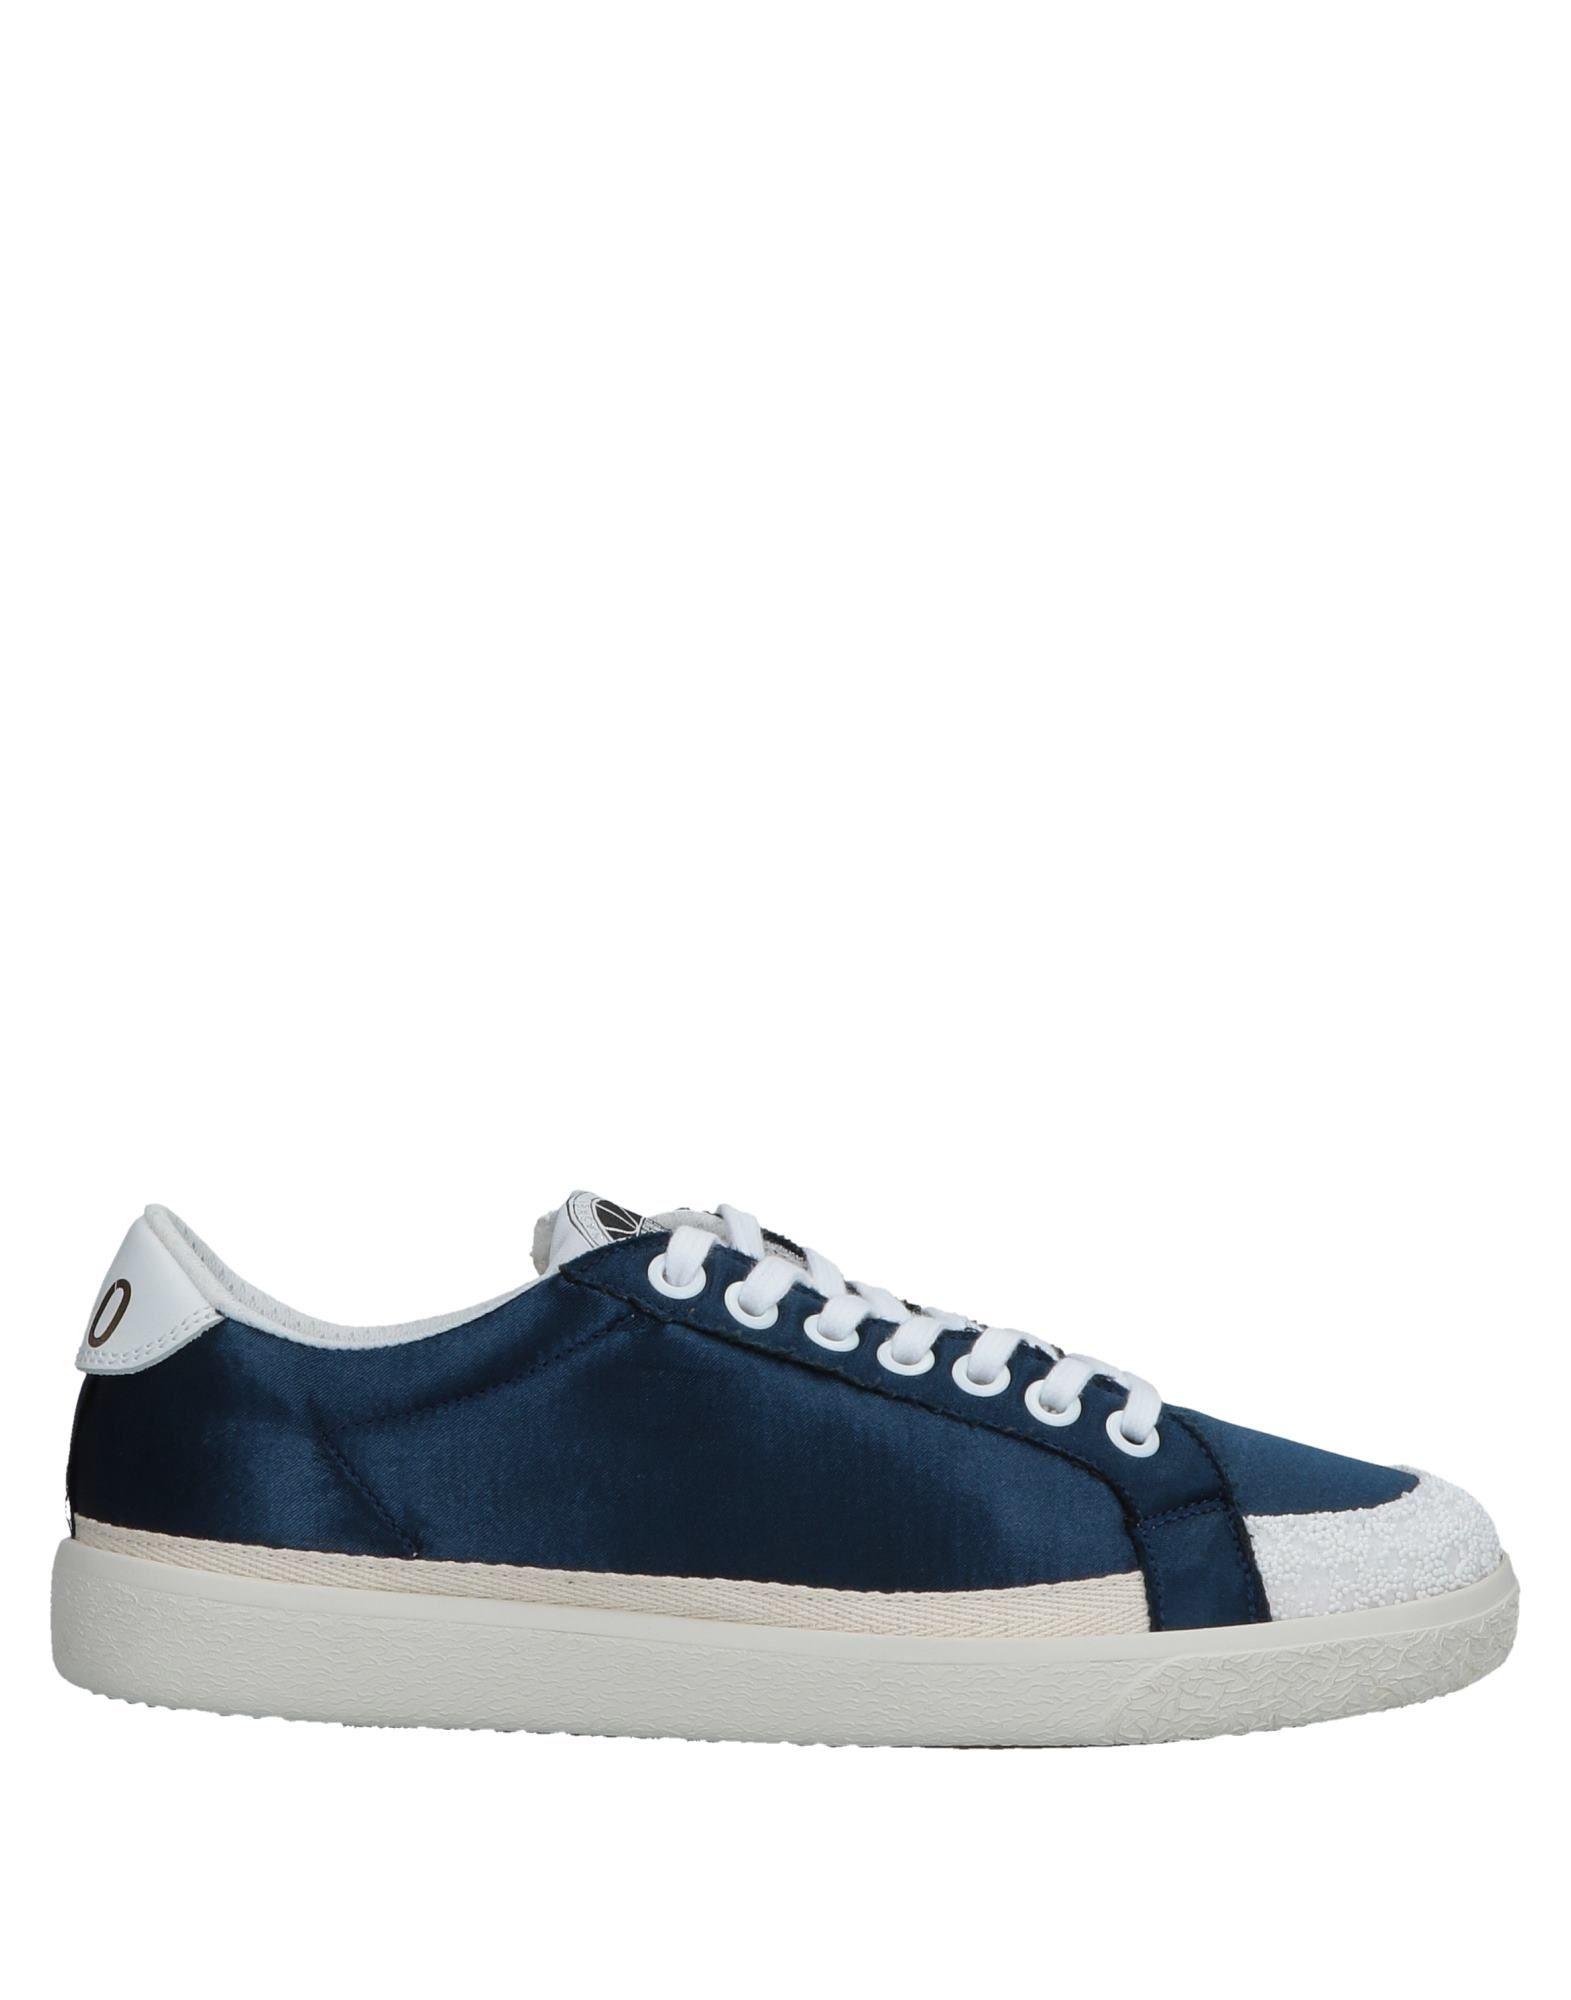 Pantofola D'oro Sneakers - Women Pantofola D'oro Sneakers - online on  Australia - Sneakers 11569992LM b86d98